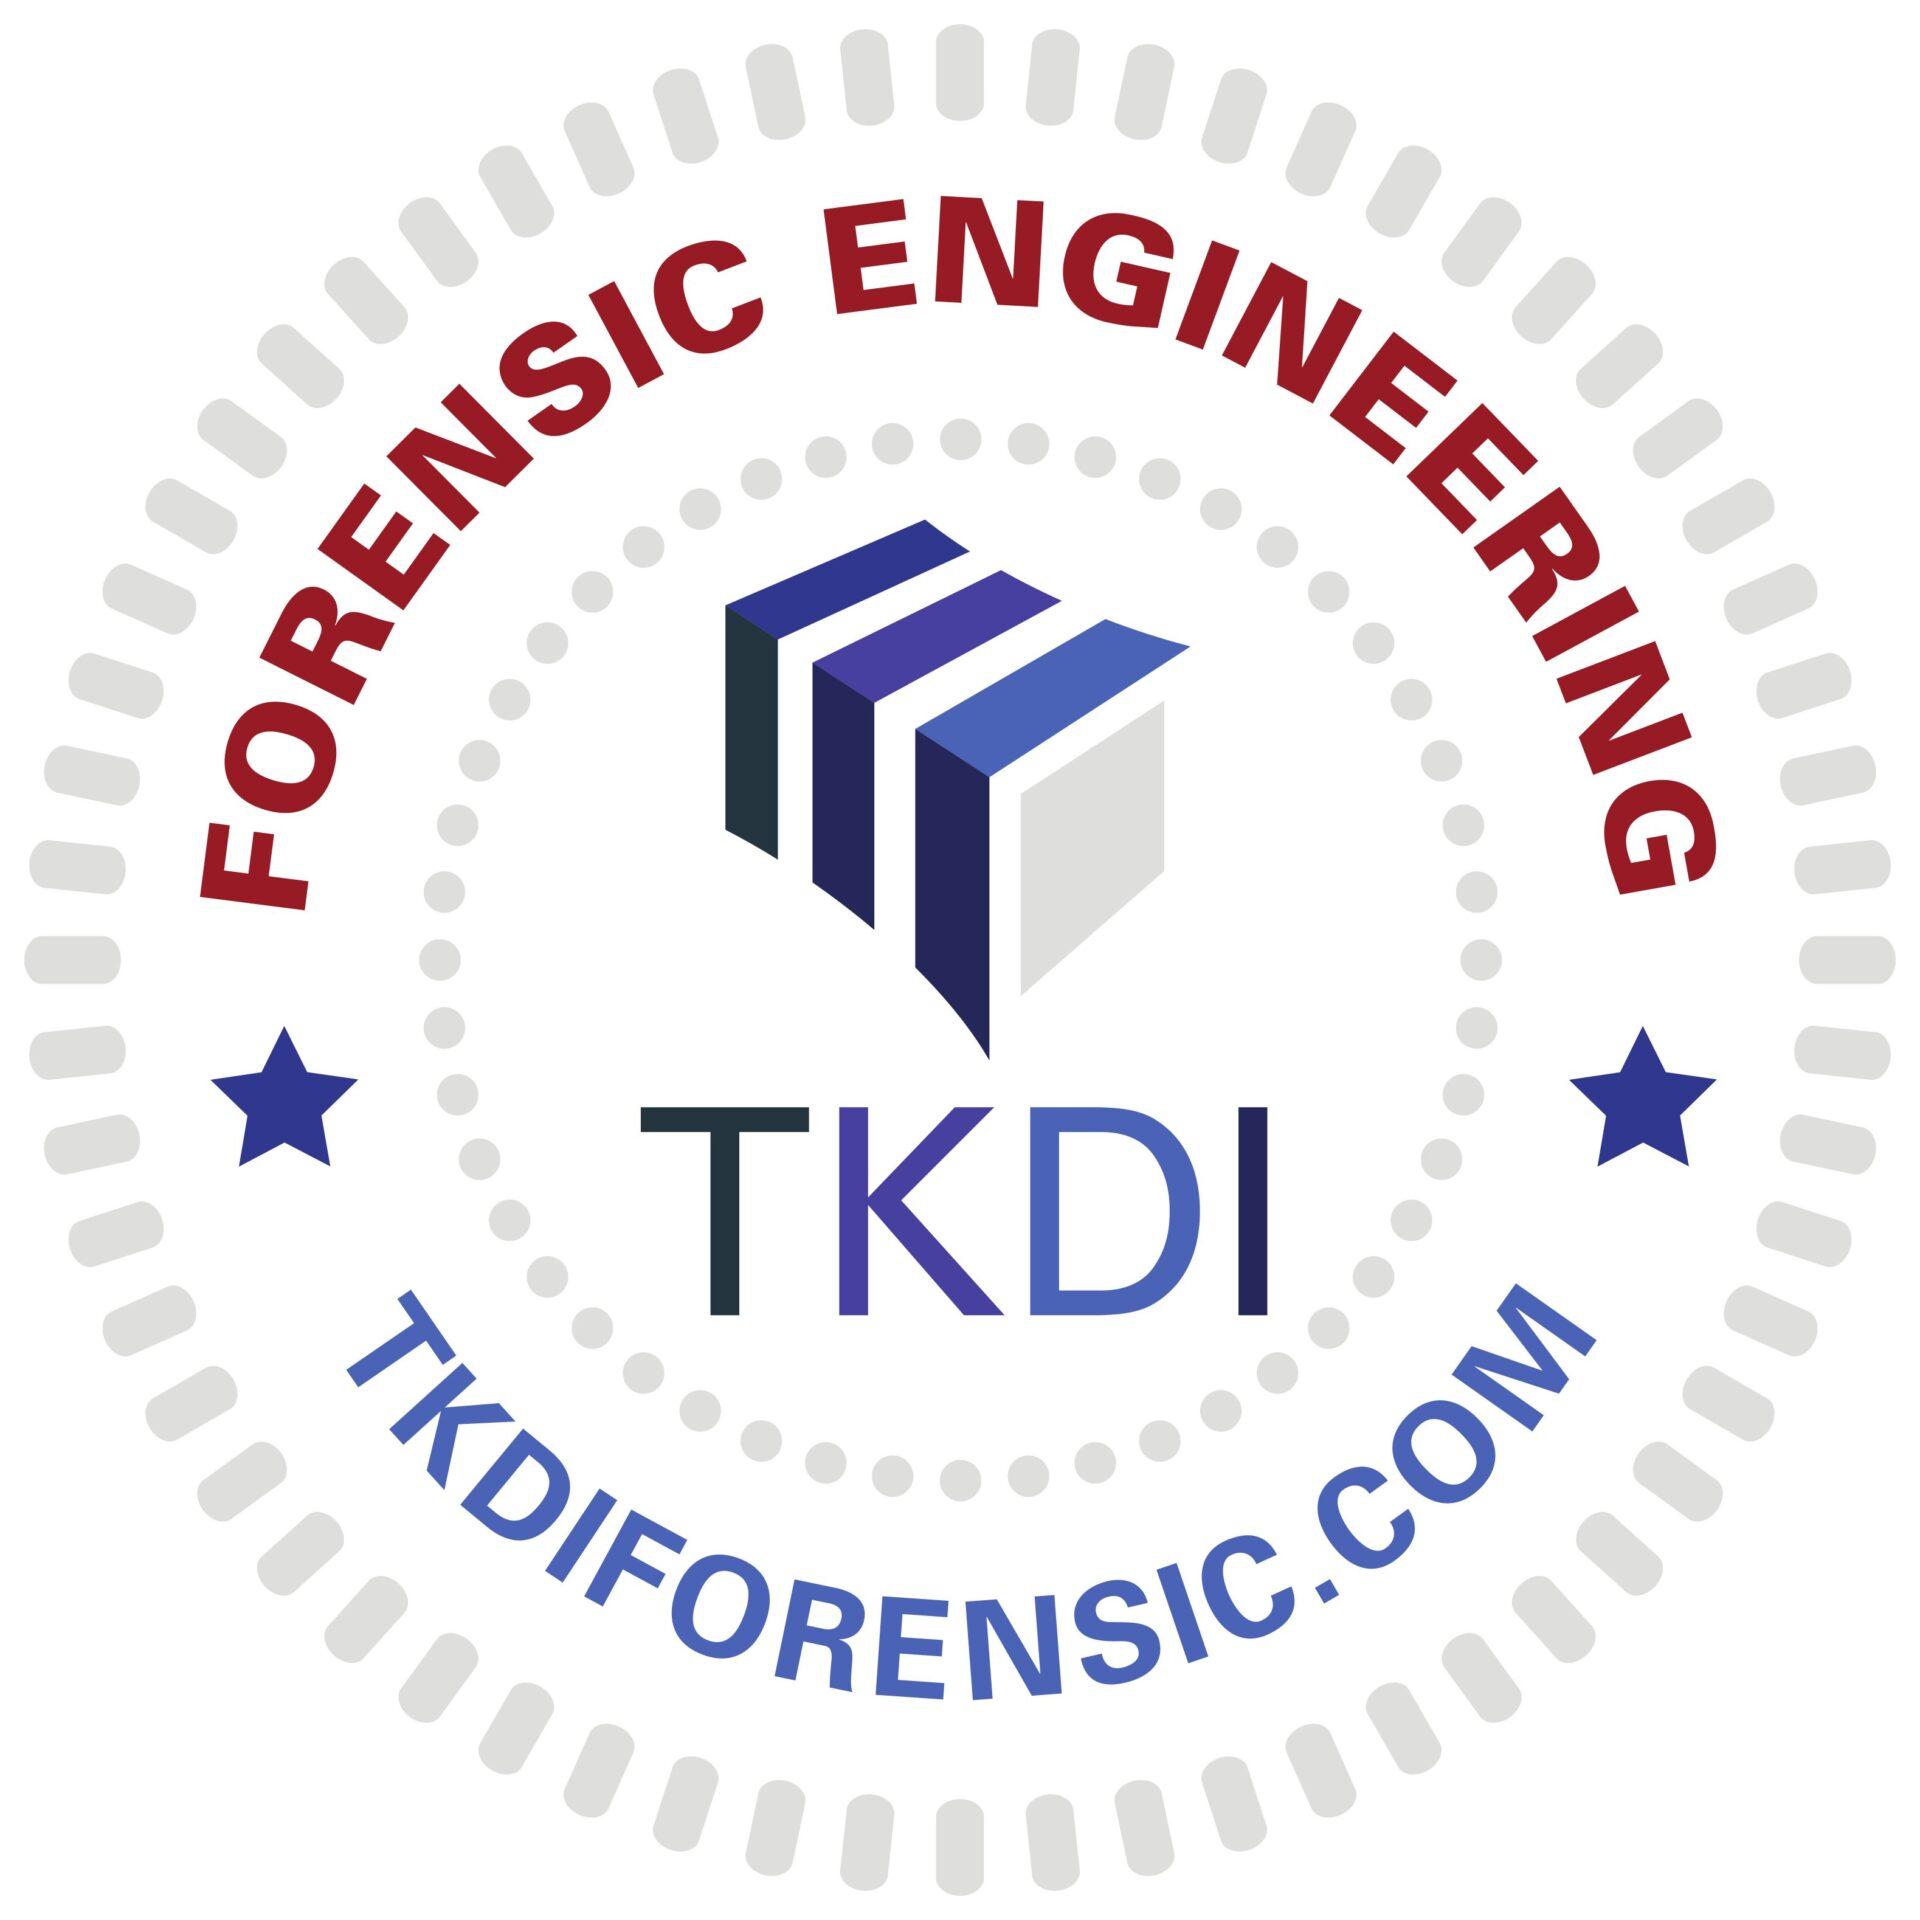 Tkdiforensic